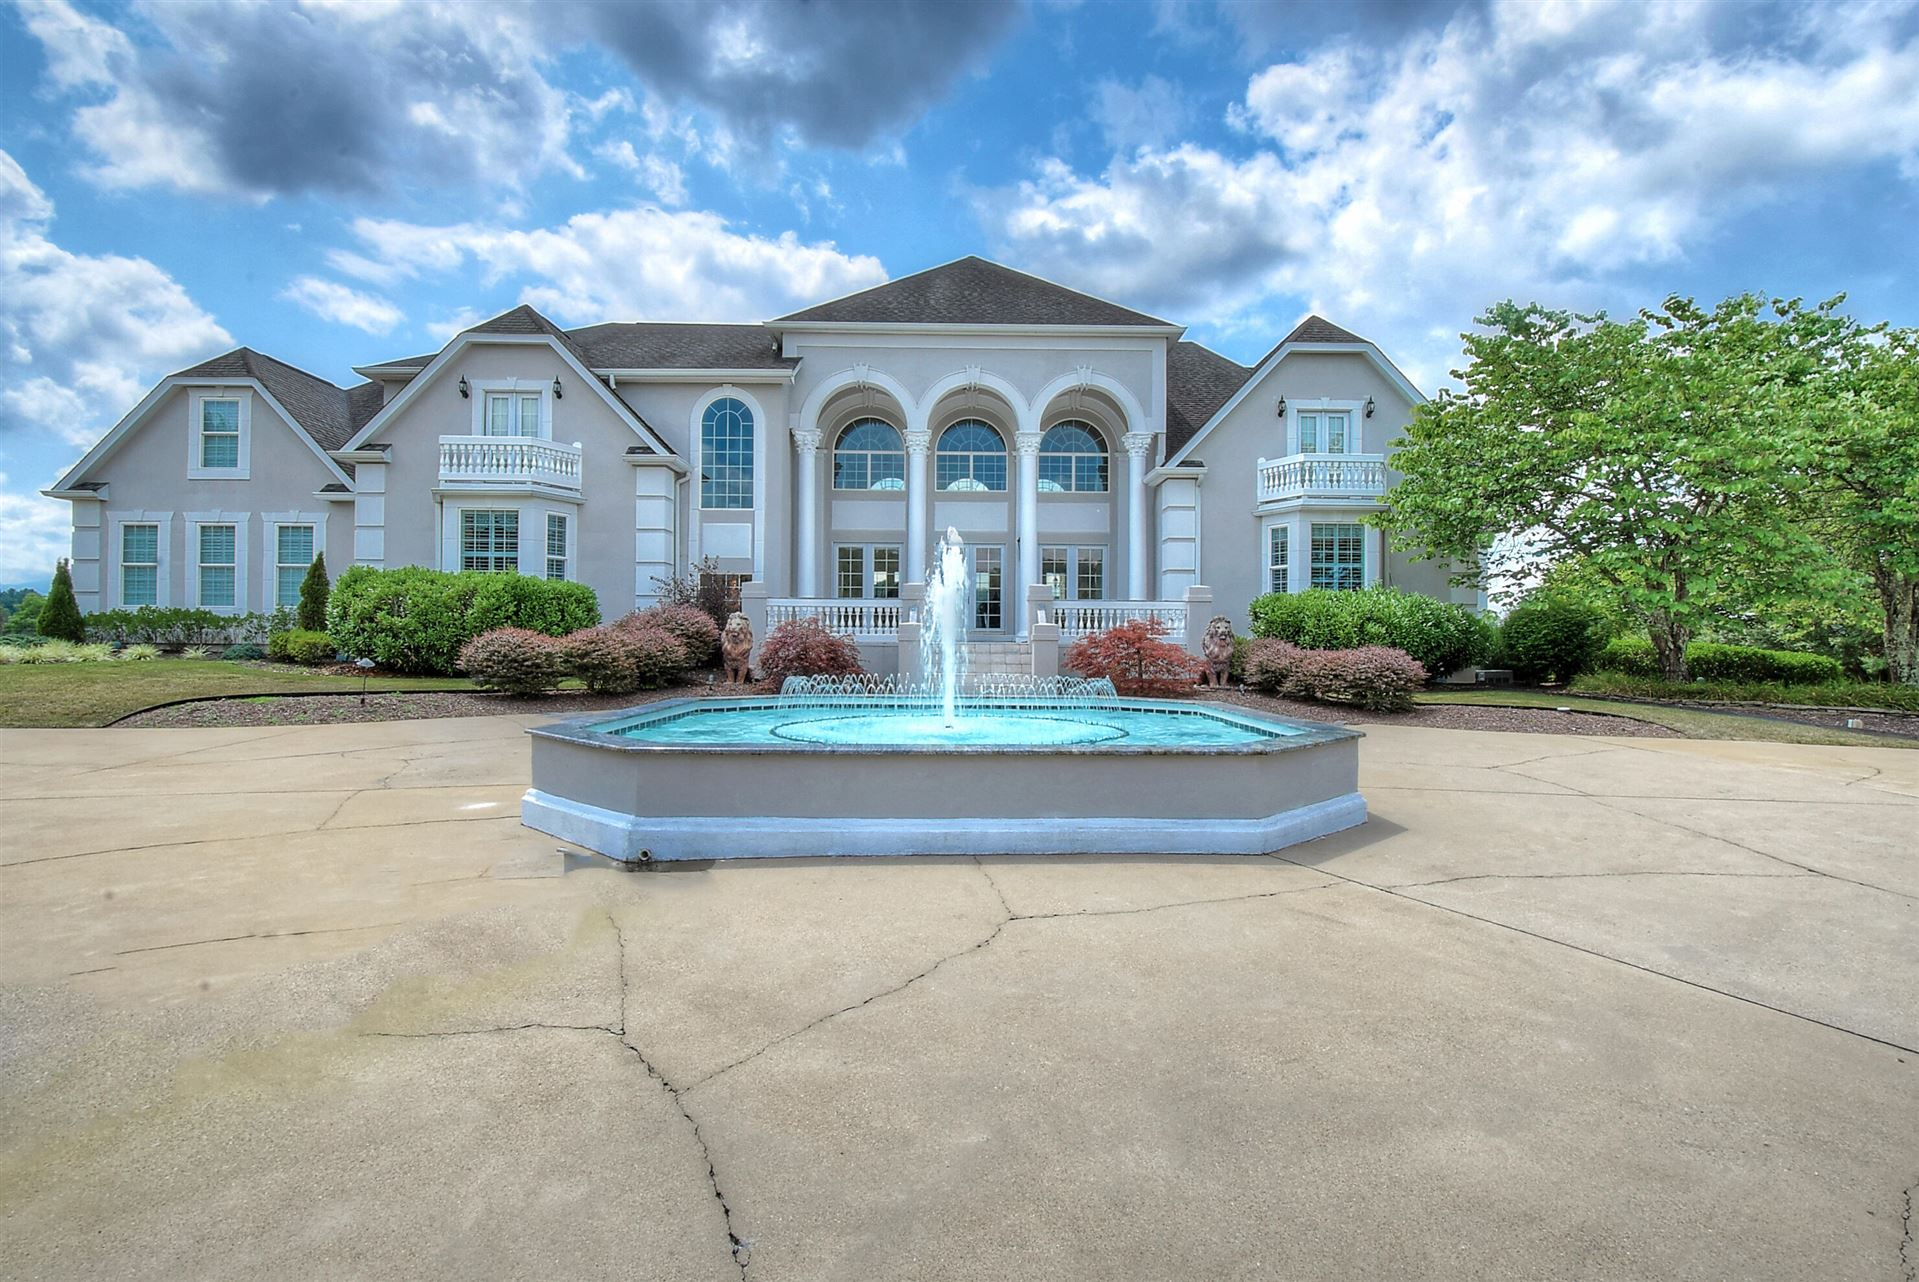 Photo of 2118 Feathers Chapel Road, Blountville, TN 37617 (MLS # 9925764)